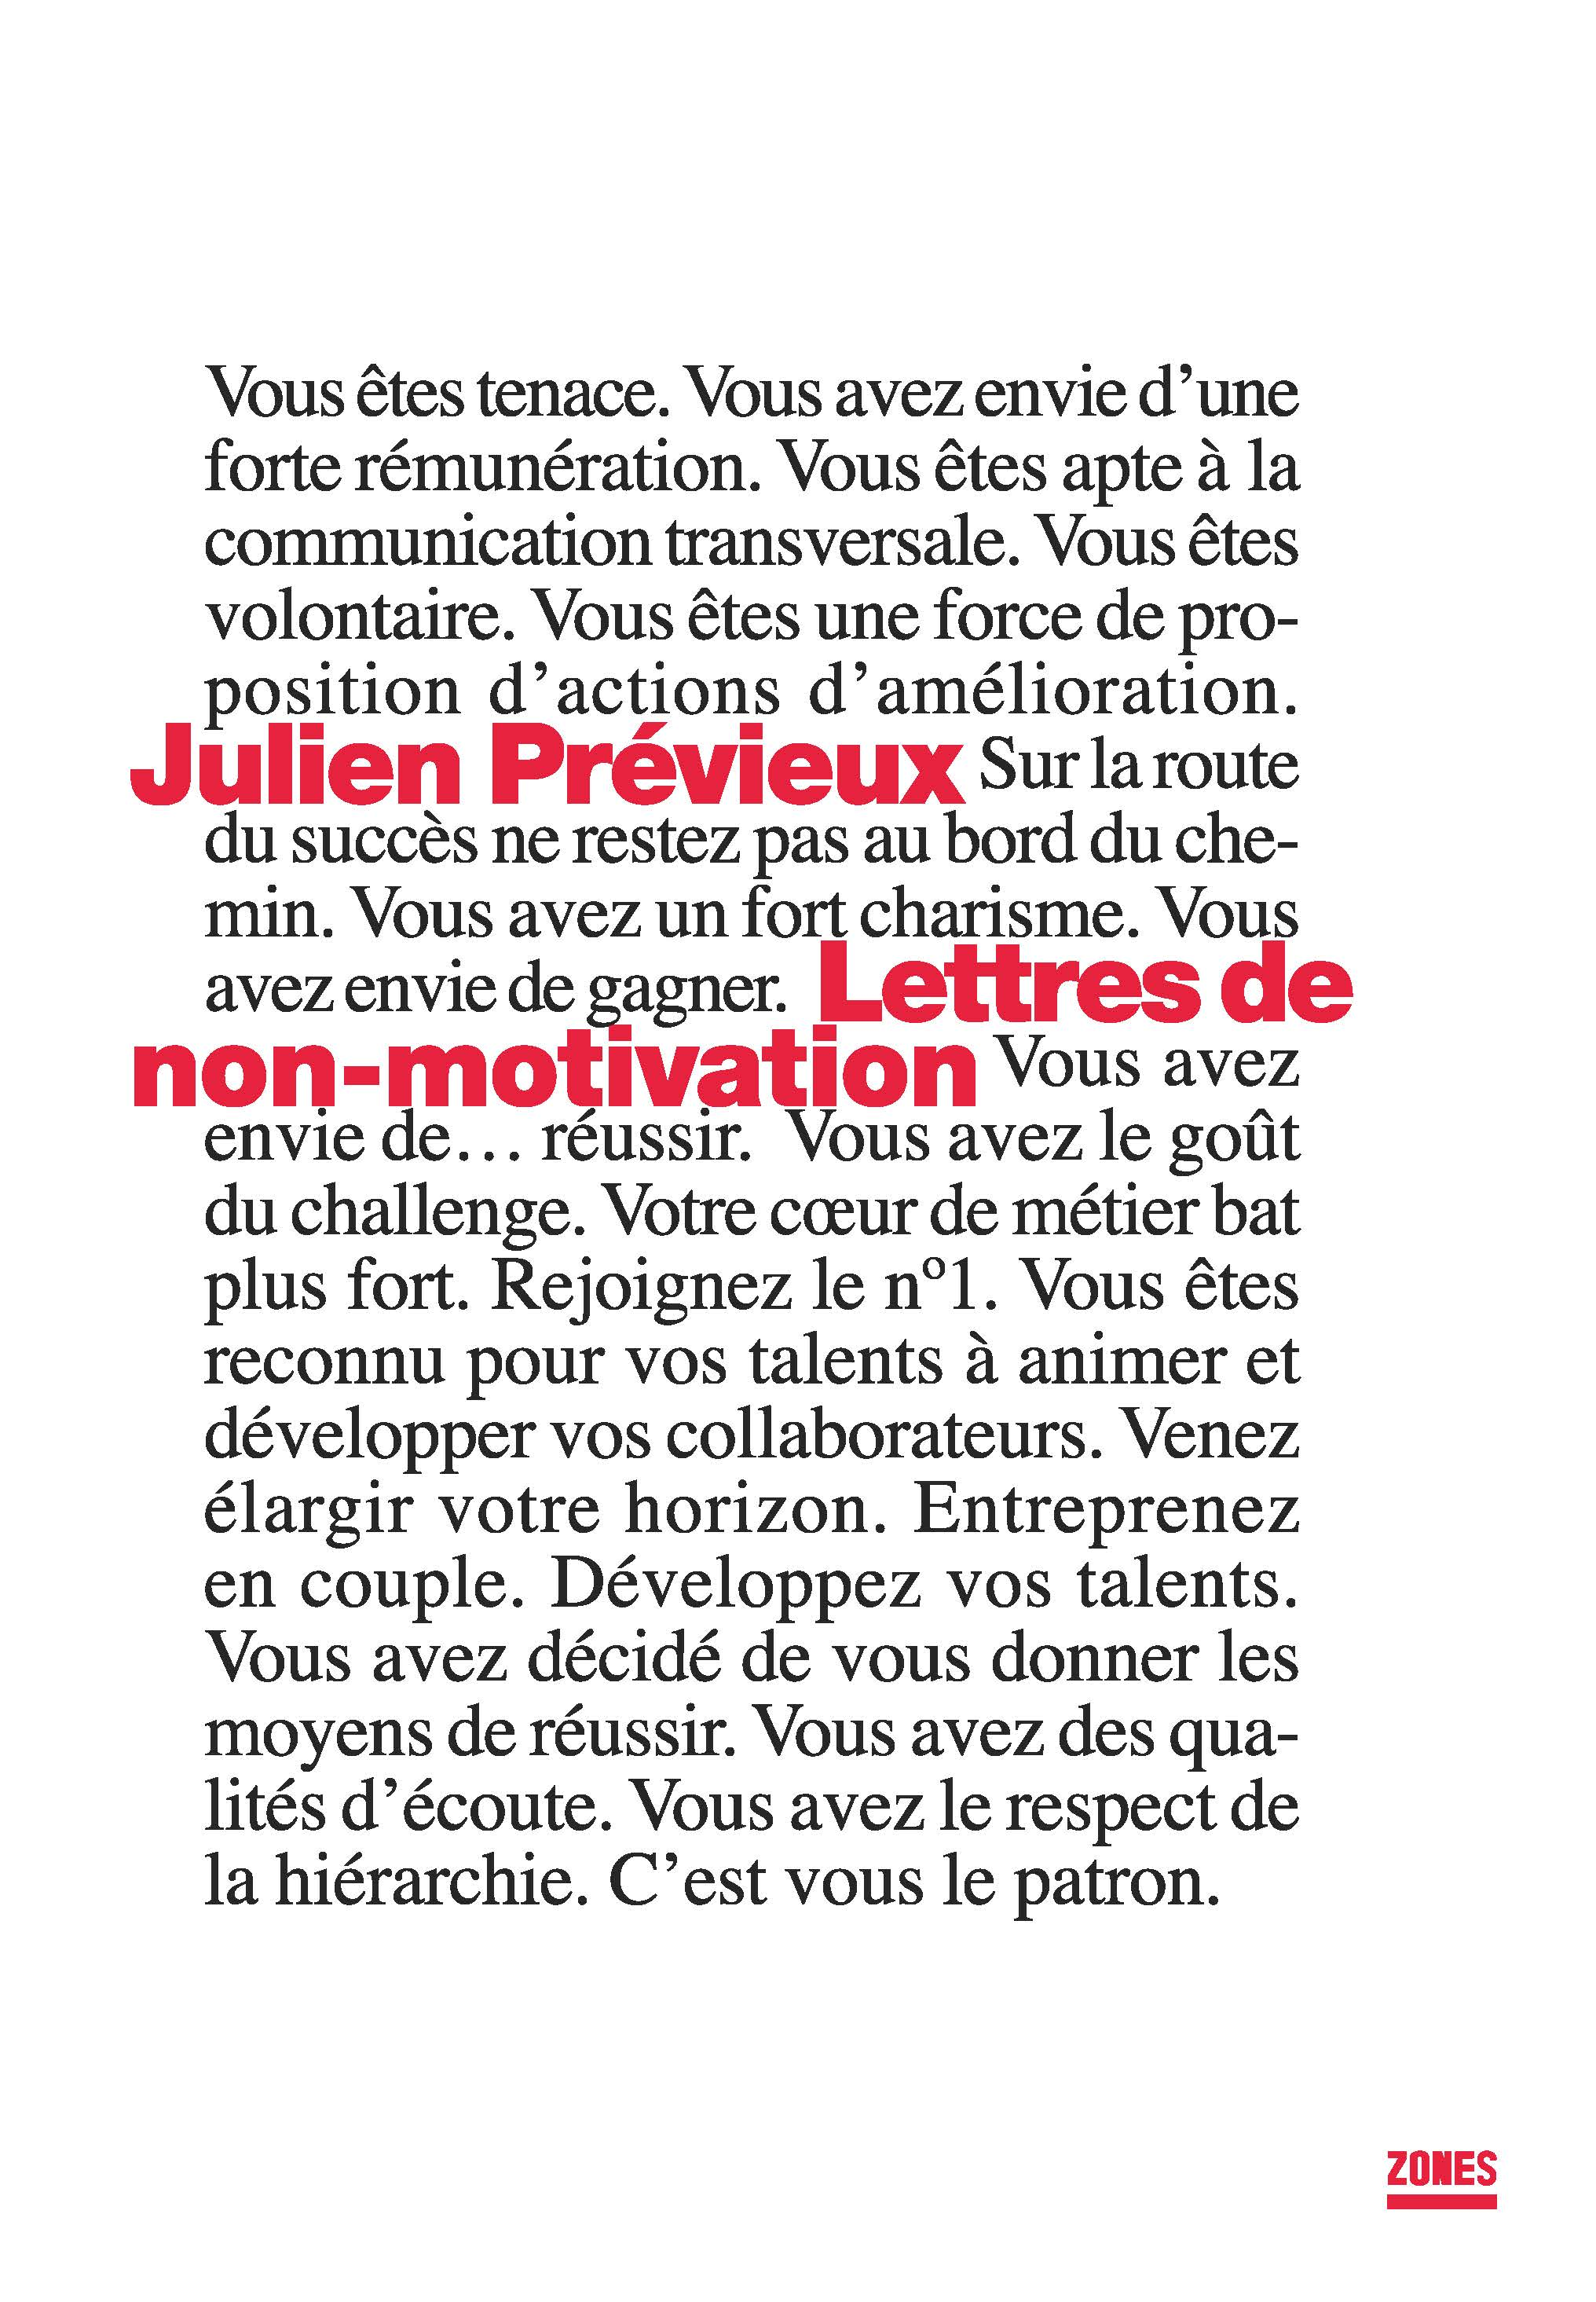 Lettres De Non Motivation Editions Zones